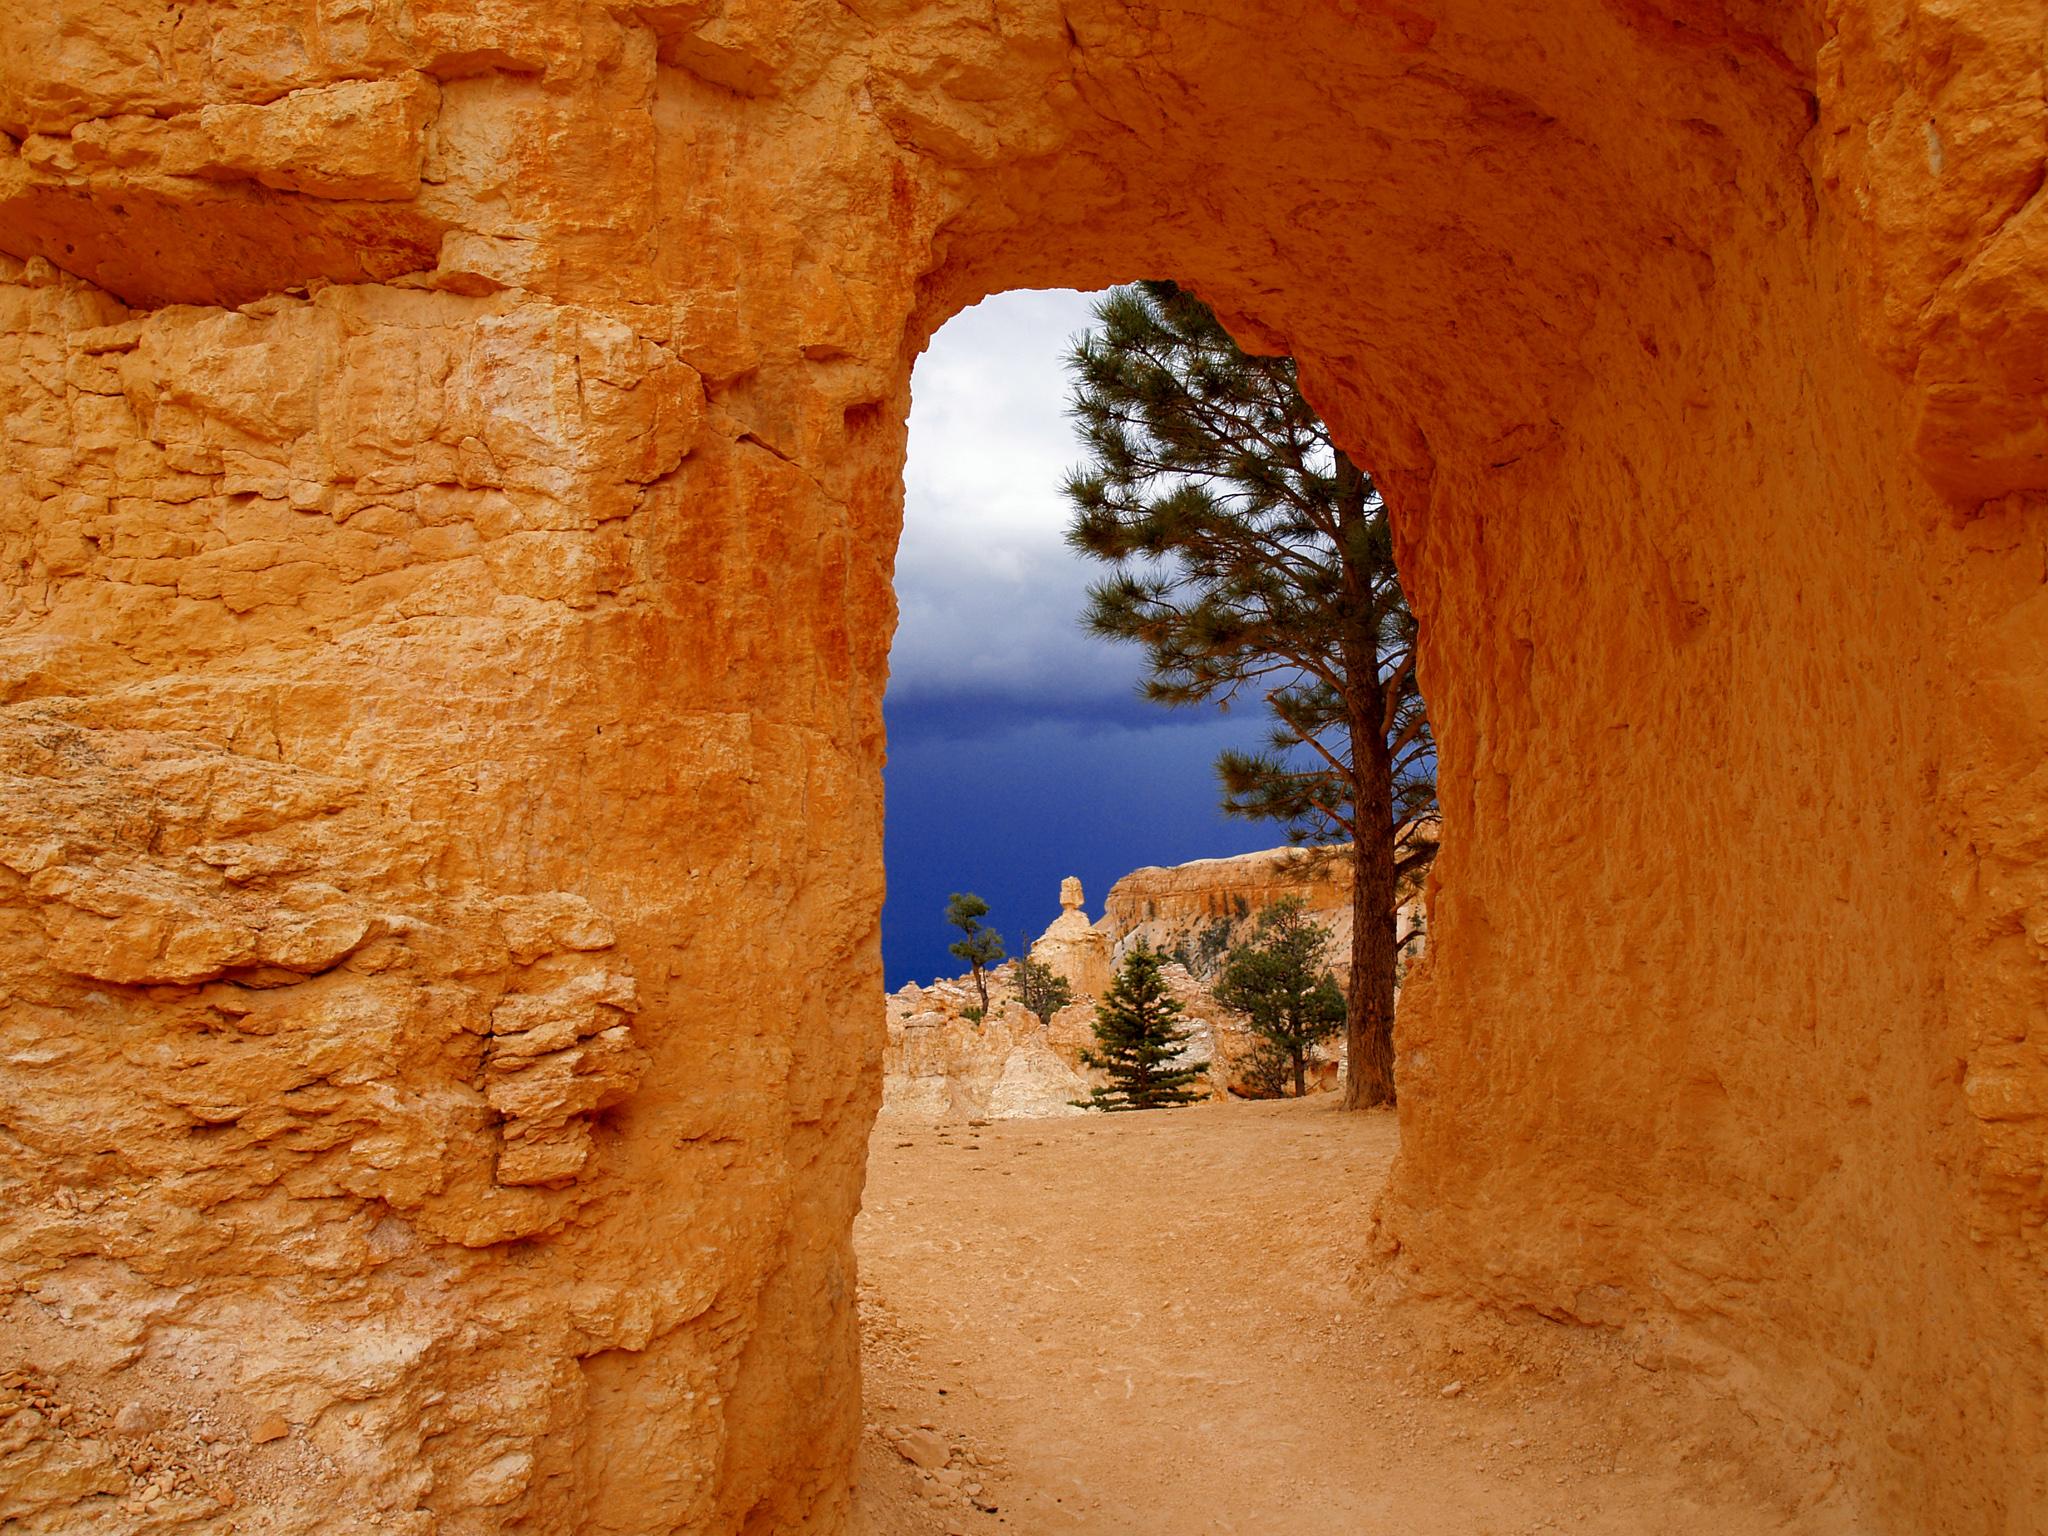 bryce-canyon-2-1391681.jpg